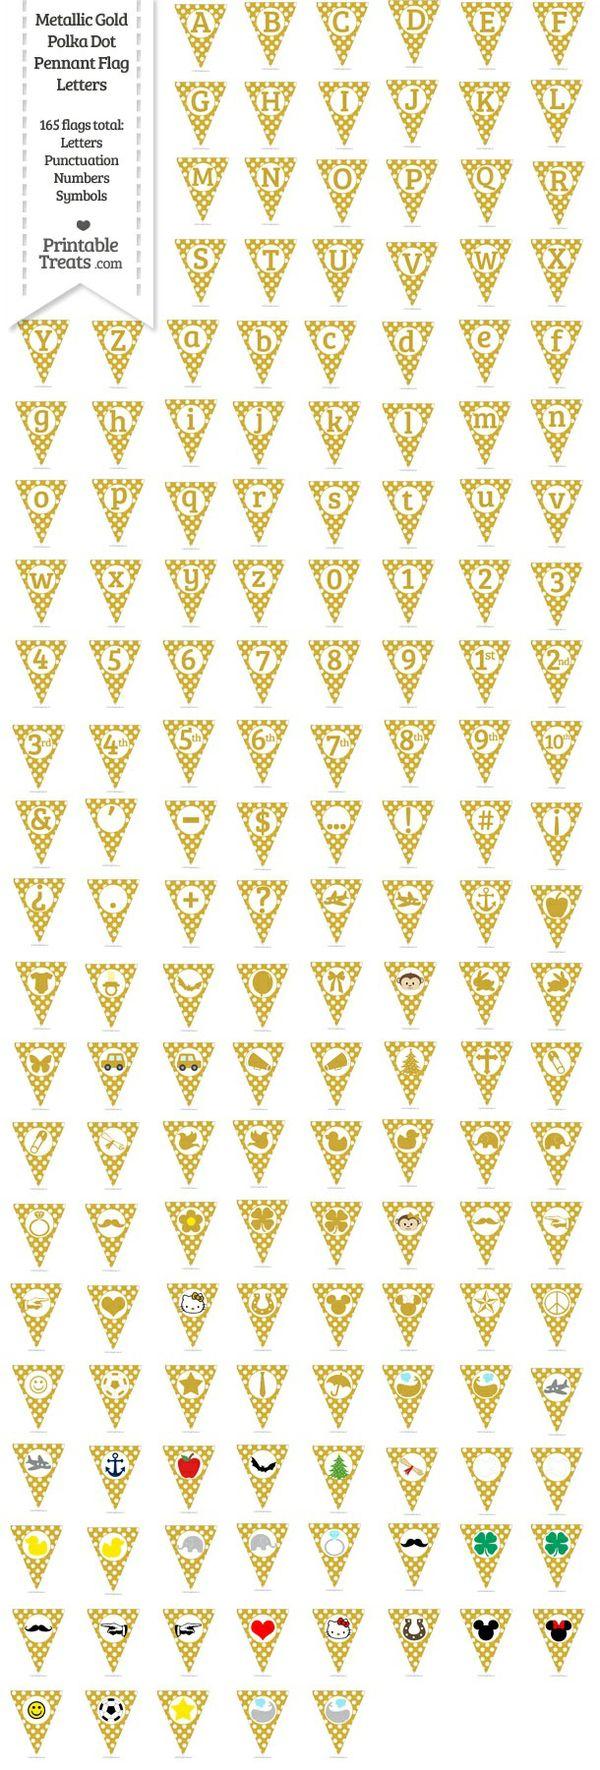 165 Metallic Gold Polka Dot Pennant Flag Letters Password